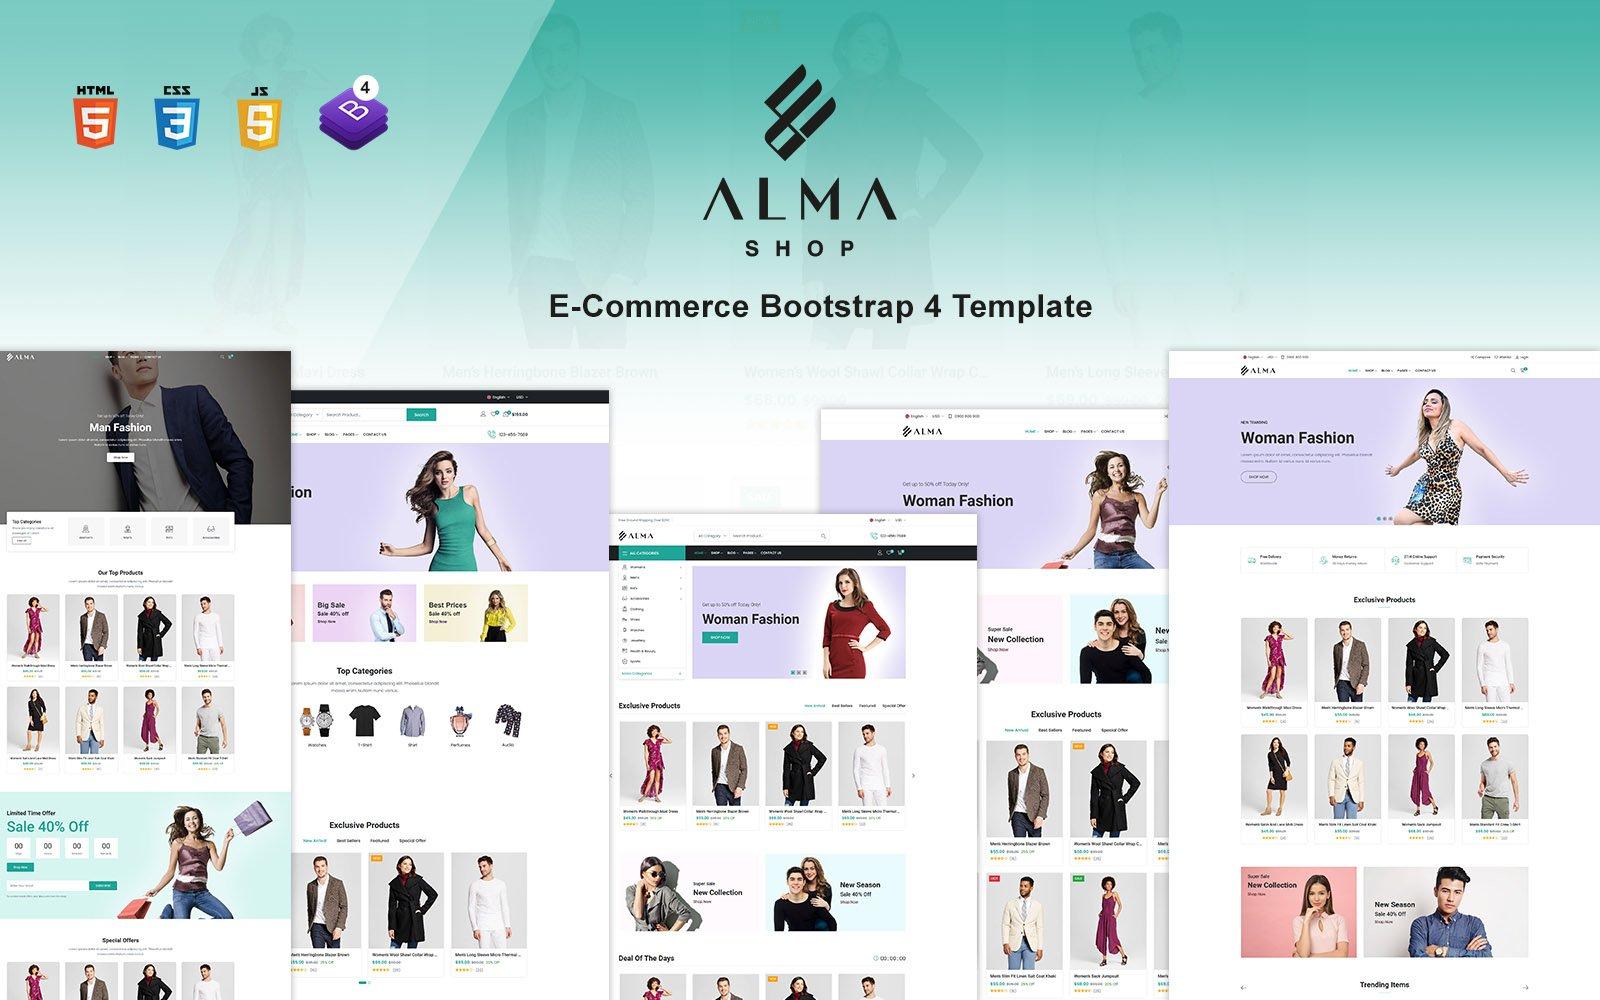 """Alma Shop - eCommerce Bootstrap 4 Website Template"" 响应式网页模板 #170978"